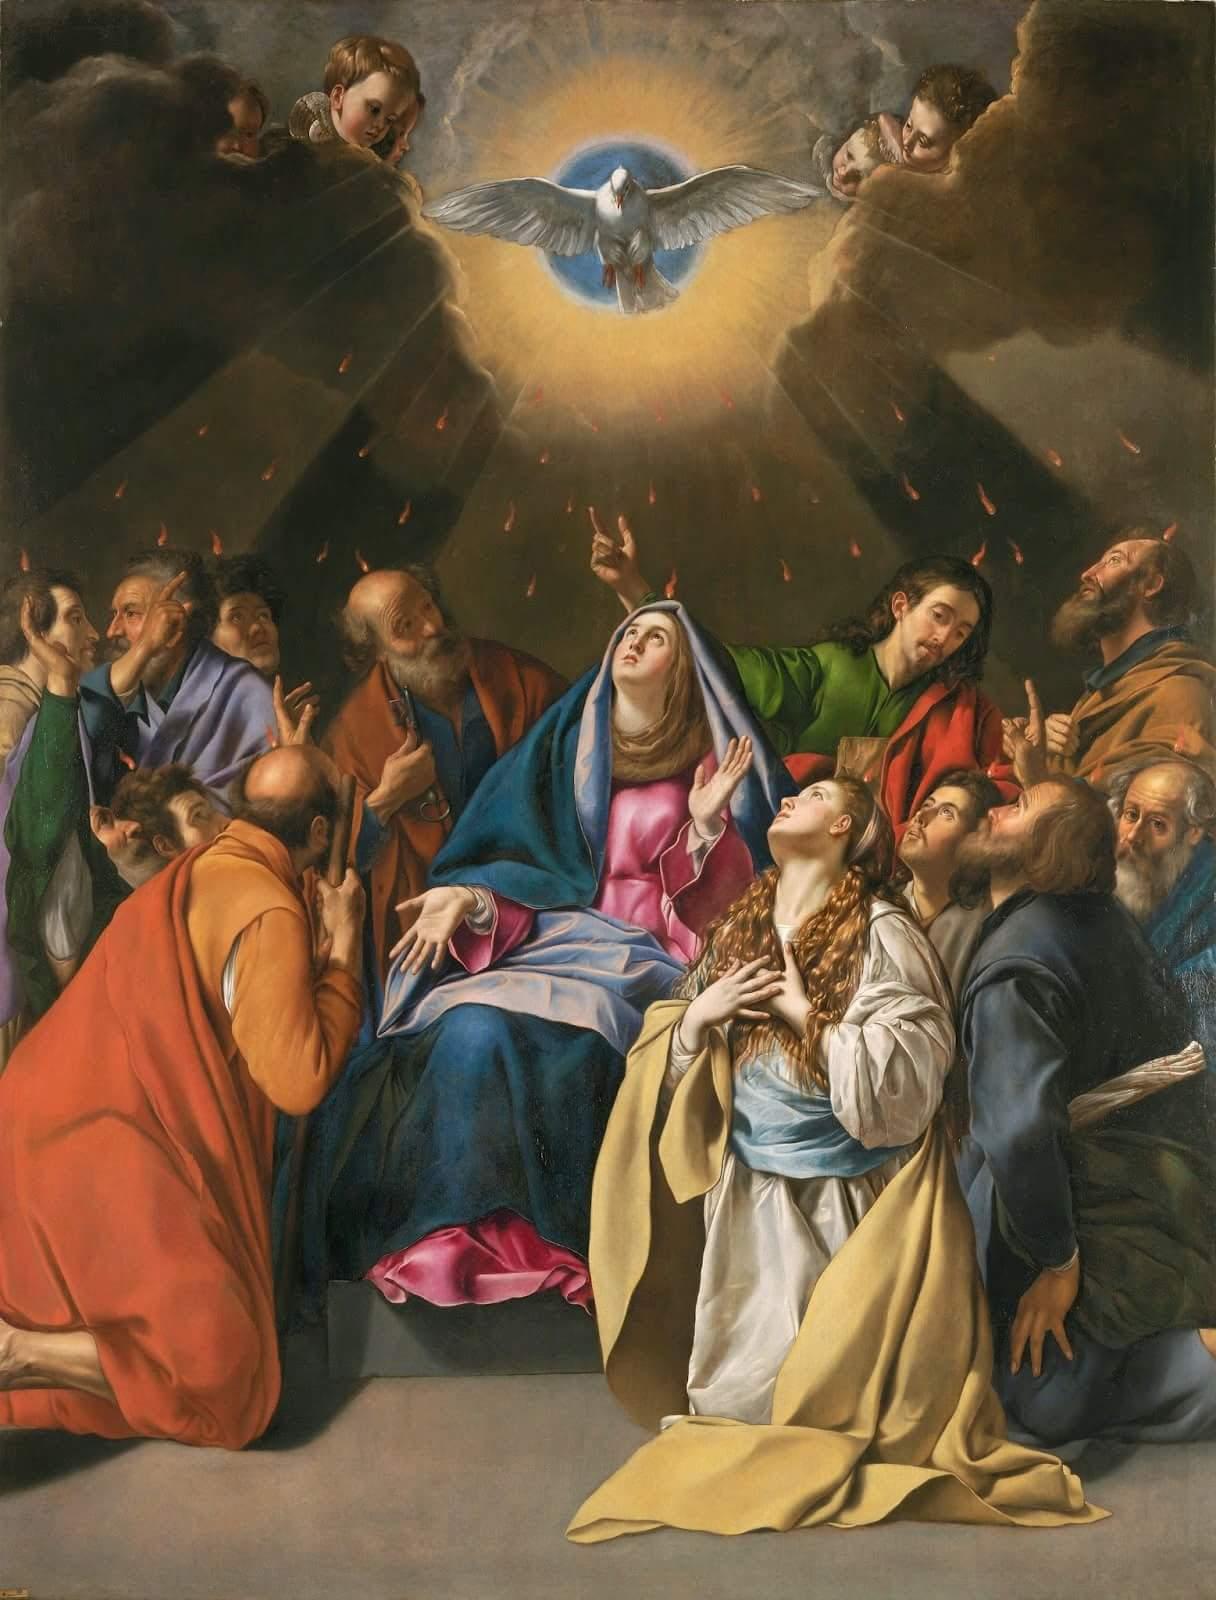 pentecost - photo #24